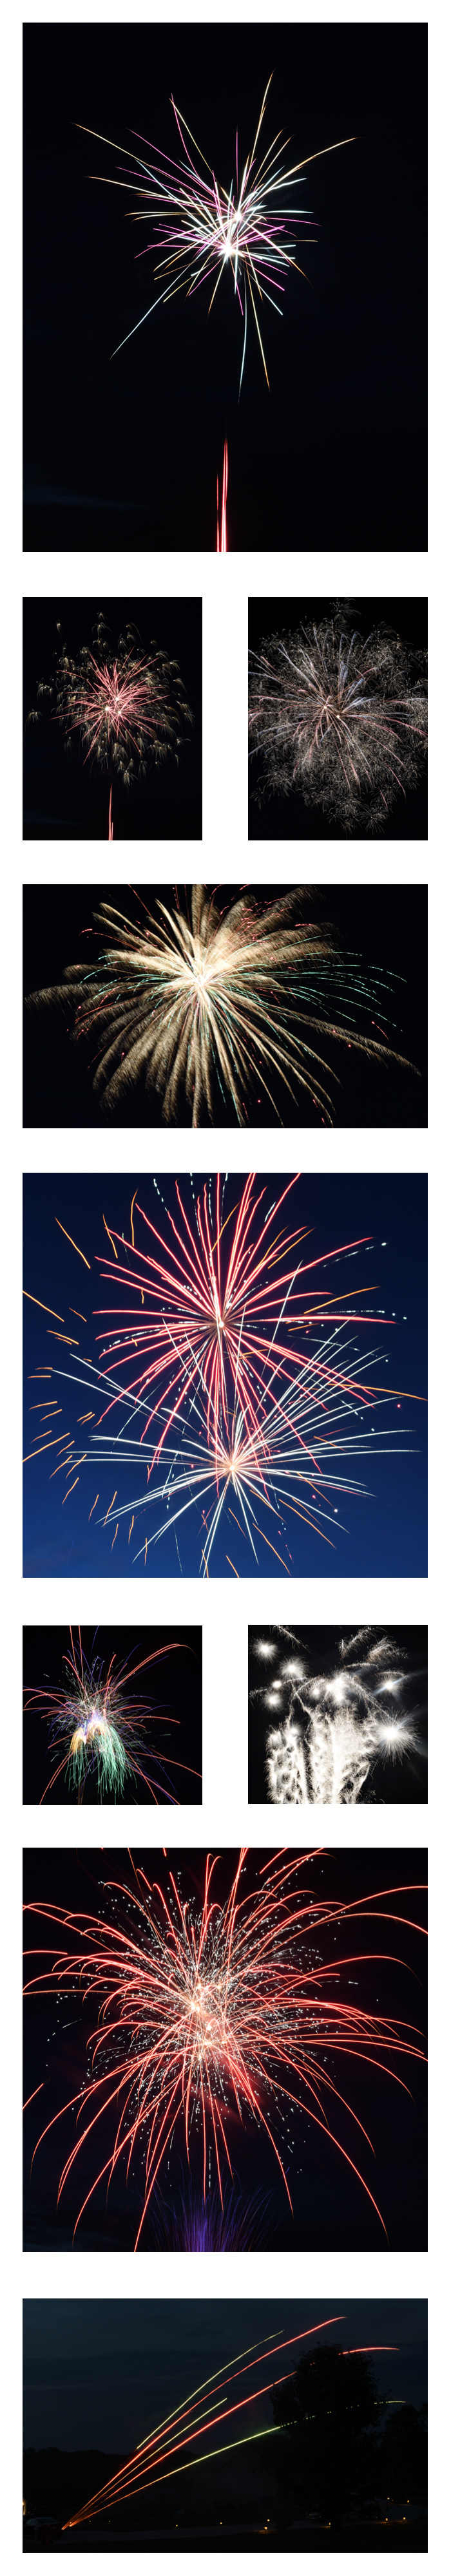 Fireworks Blog.jpg